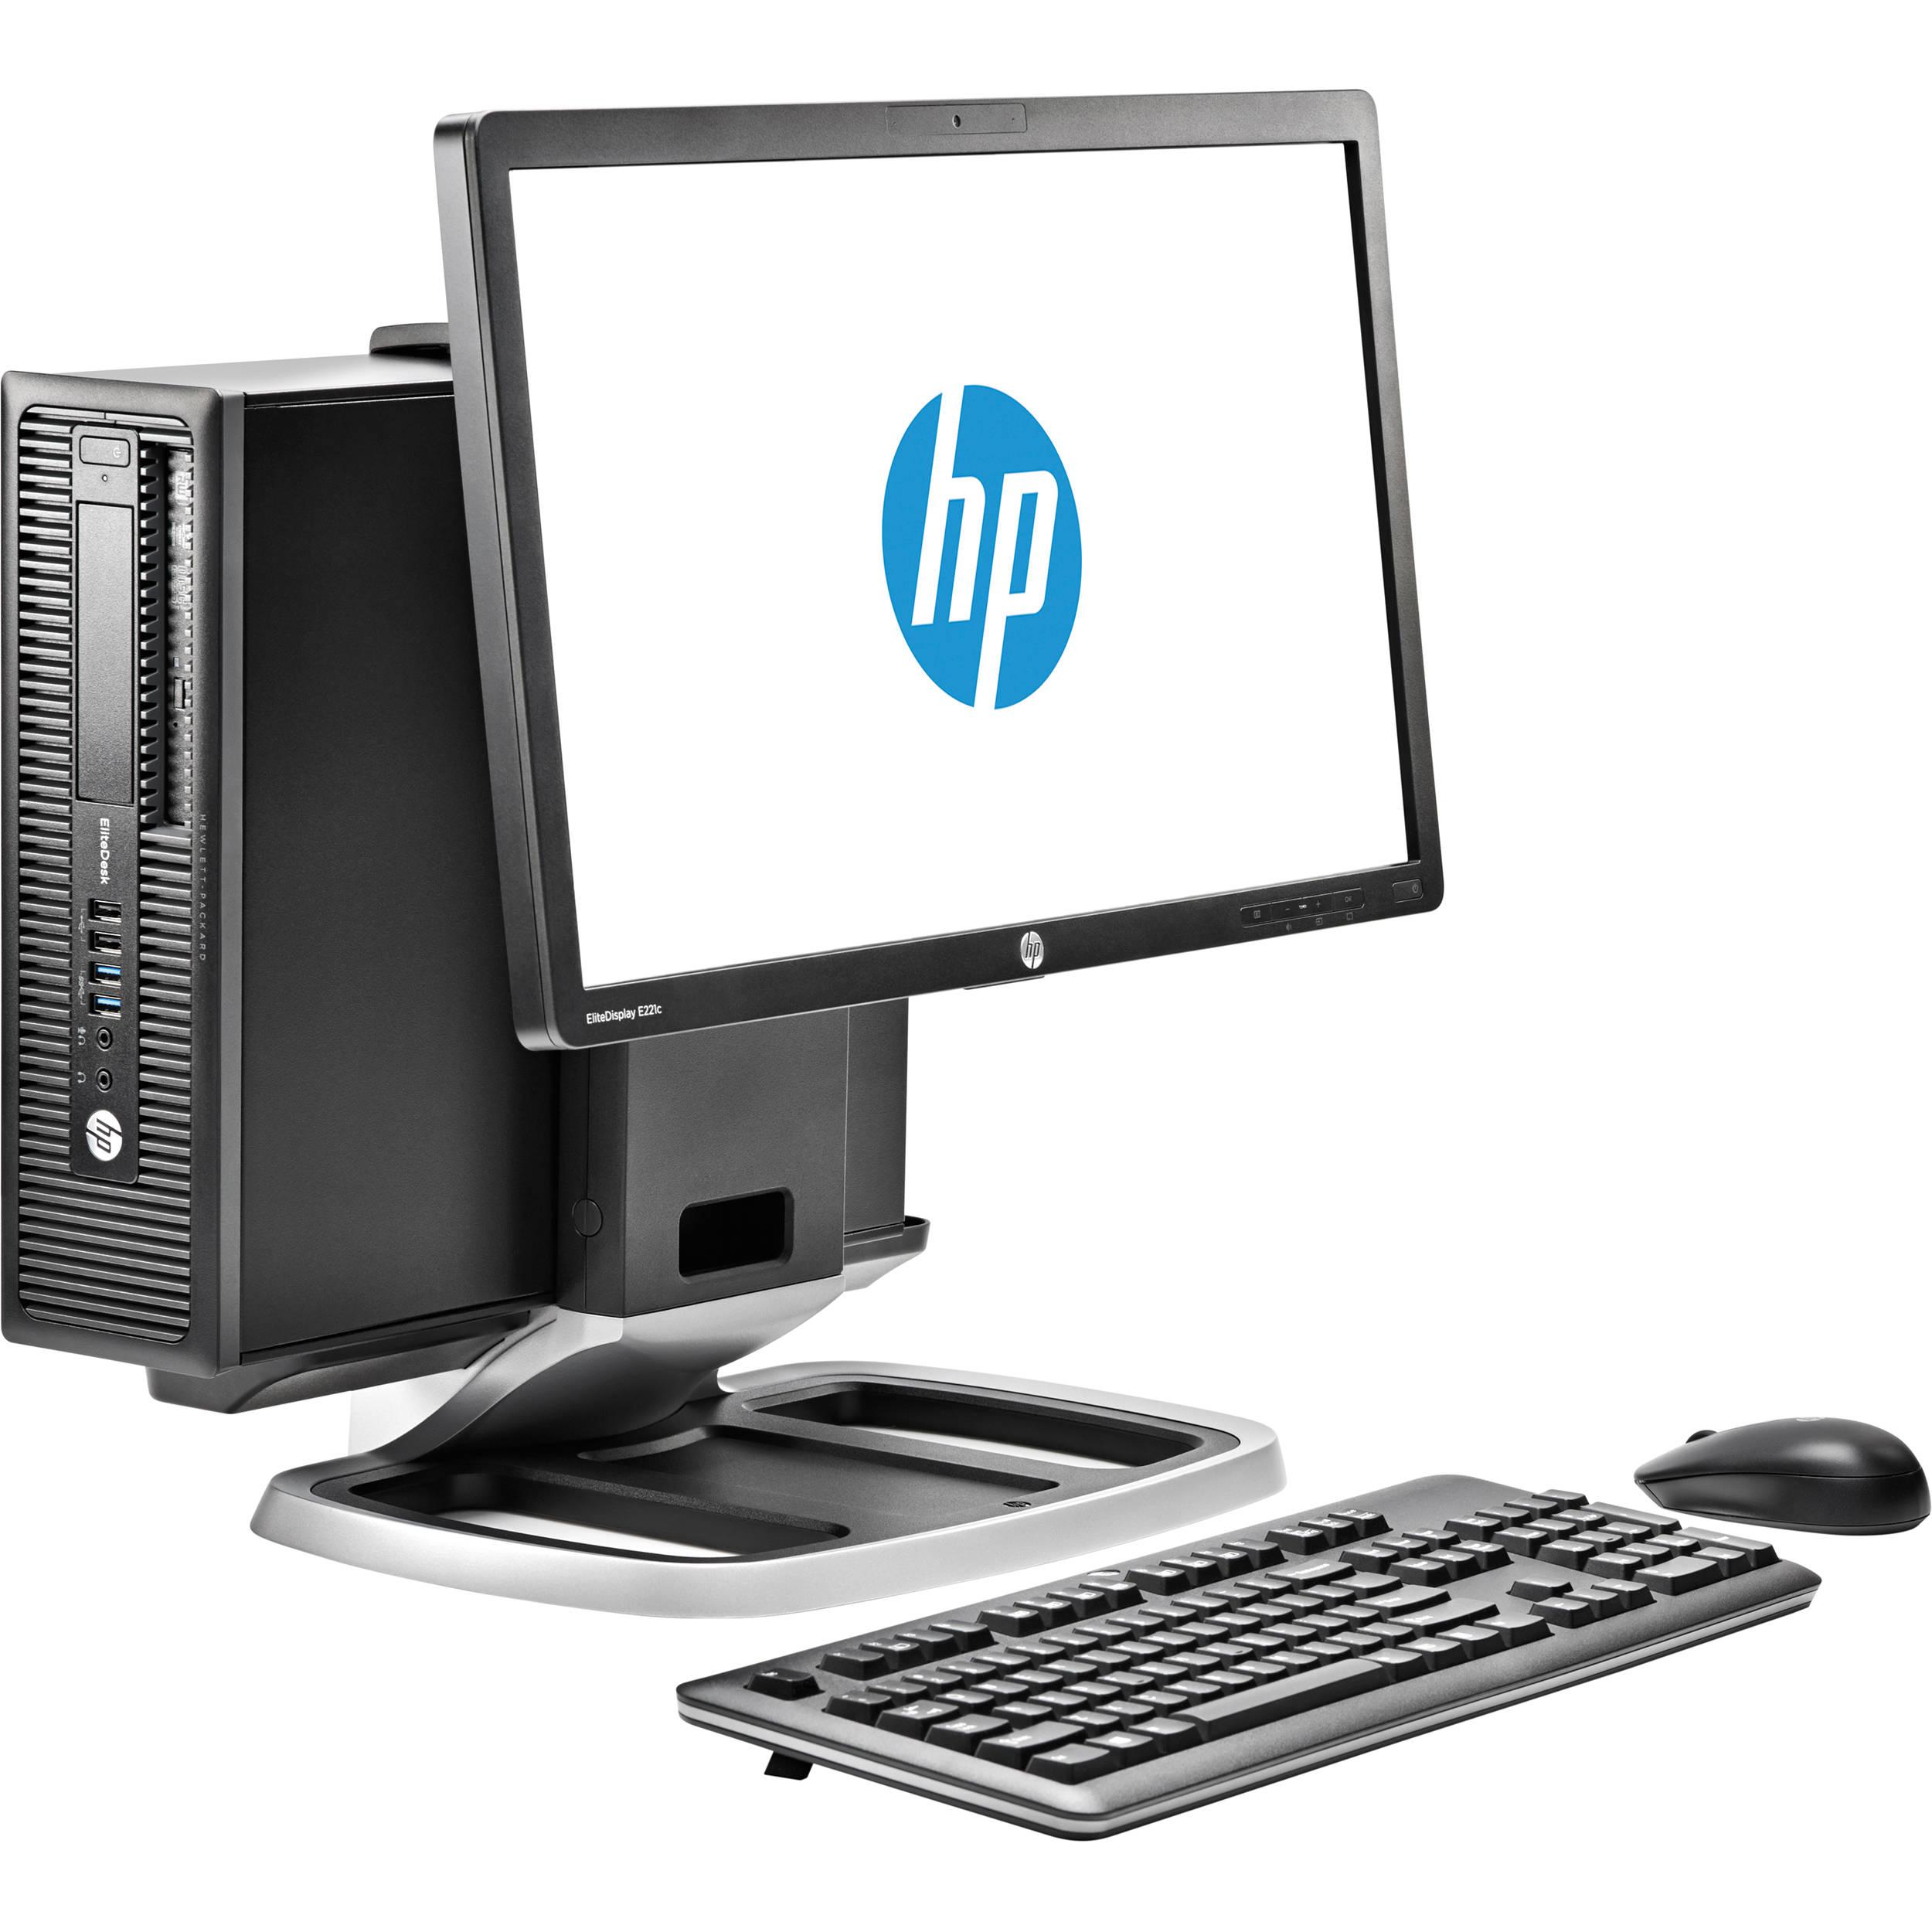 HP EliteDesk 800 G1 J6D83UT Small Form Factor Desktop Computer